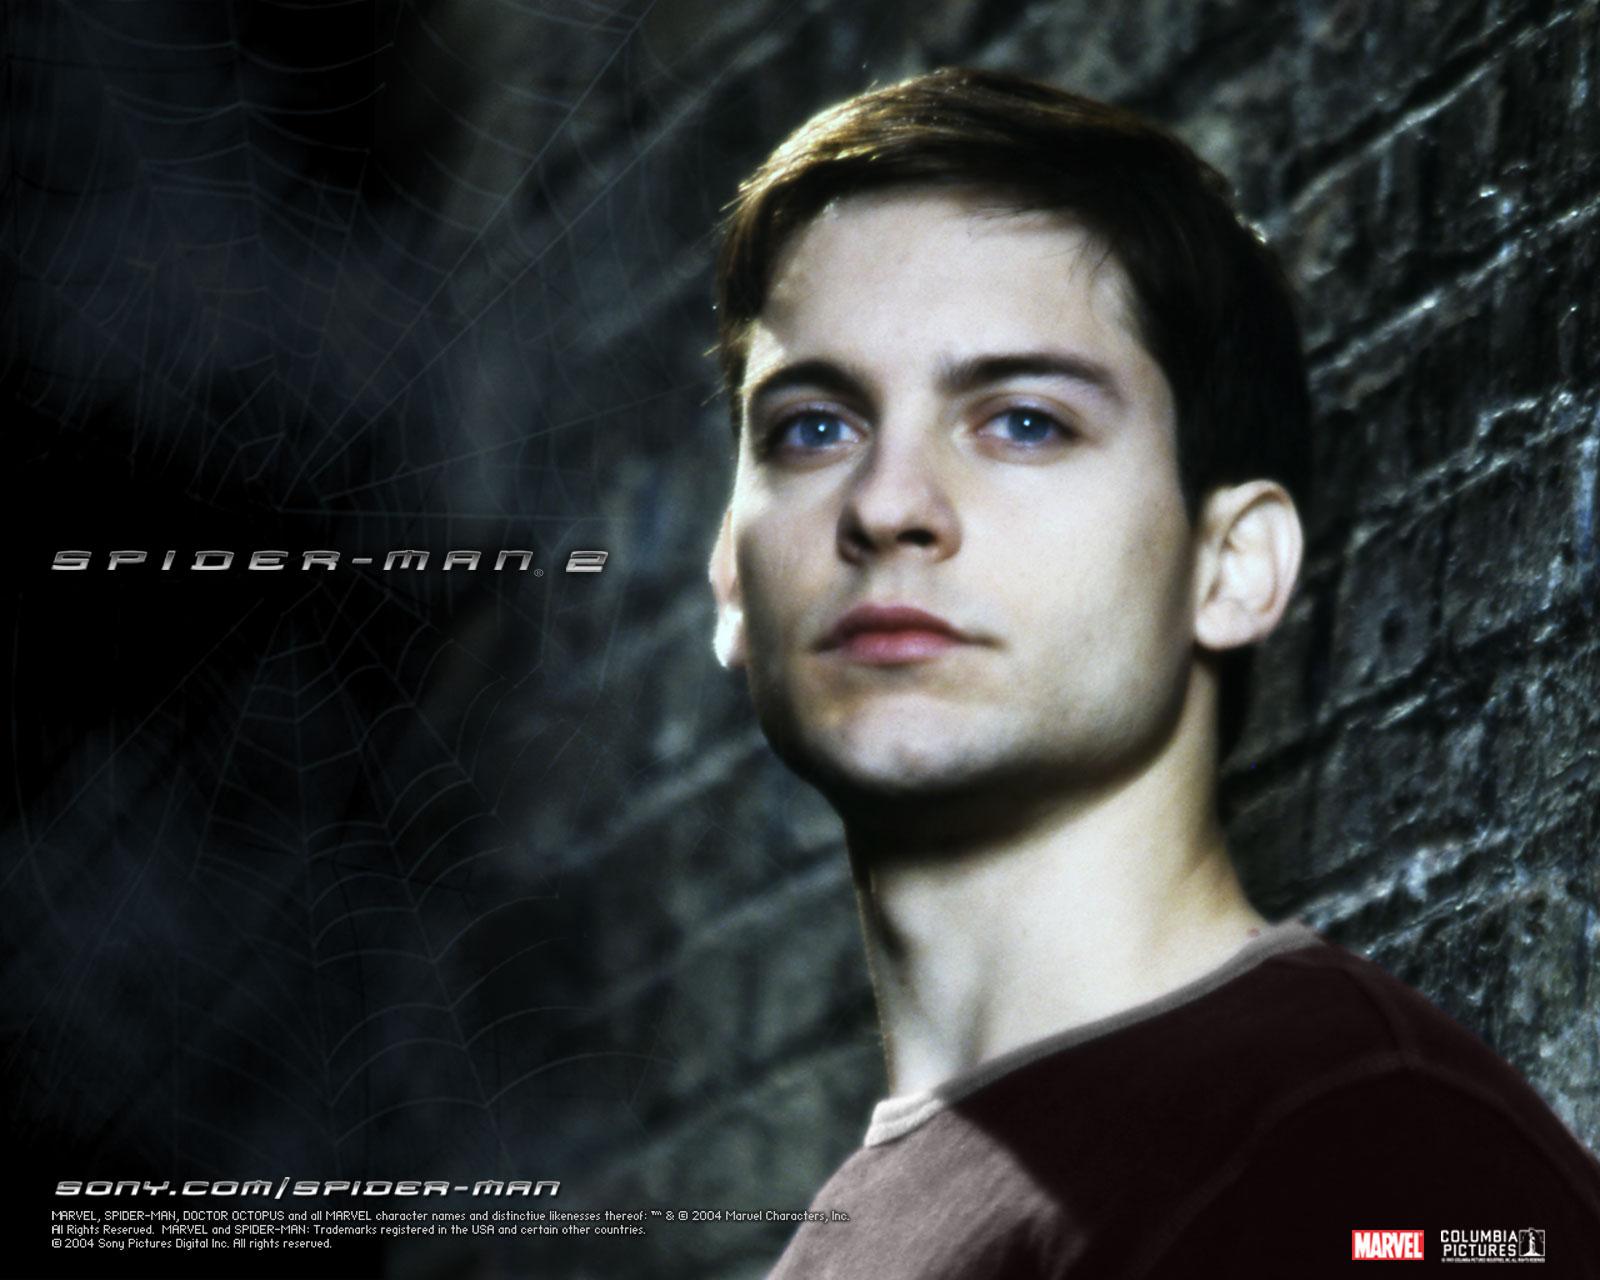 http://2.bp.blogspot.com/-yKRwDswb1Gg/TtRr7NYh-JI/AAAAAAAAPew/xVZBVtjyDnM/s1600/Spiderman2-Tobey-Maguire.jpg